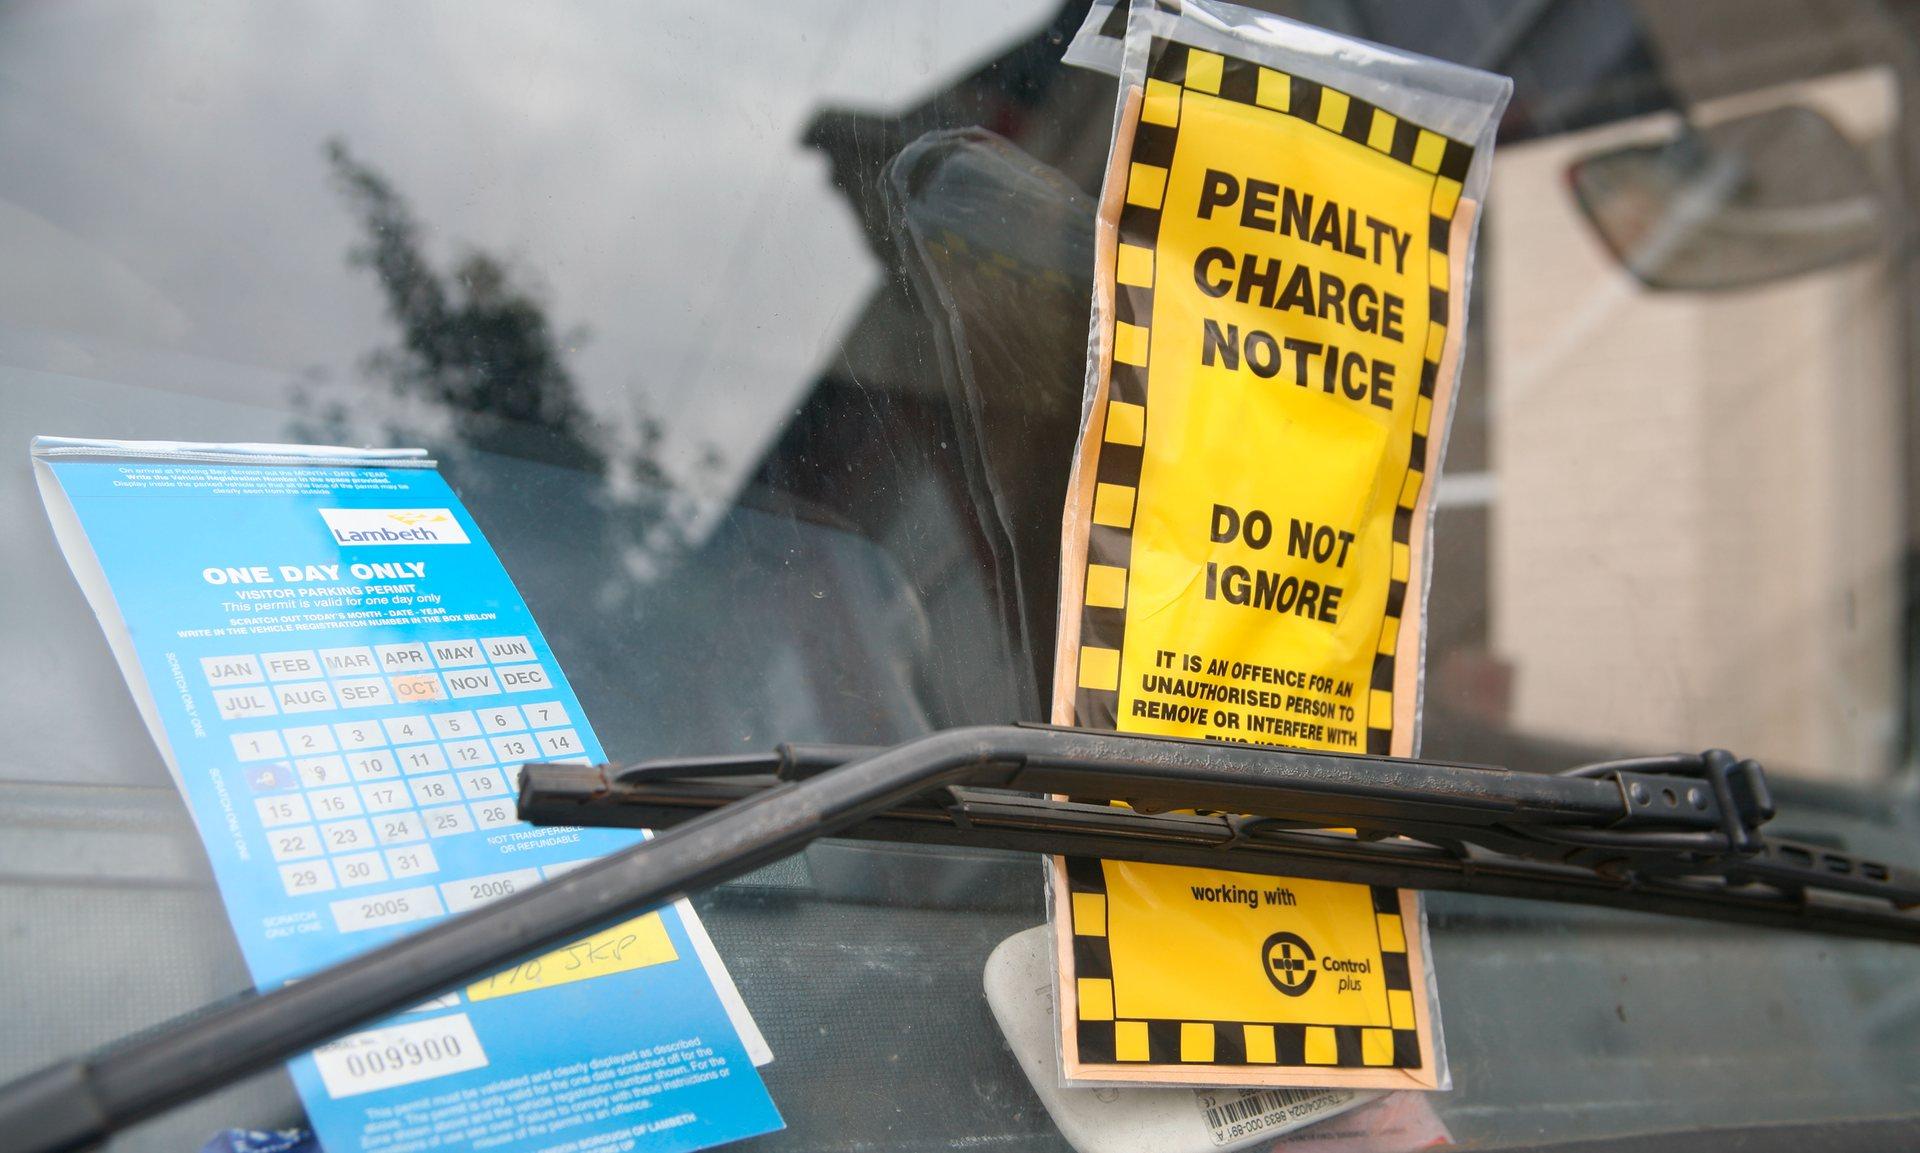 образец штрафа за неправильную парковку